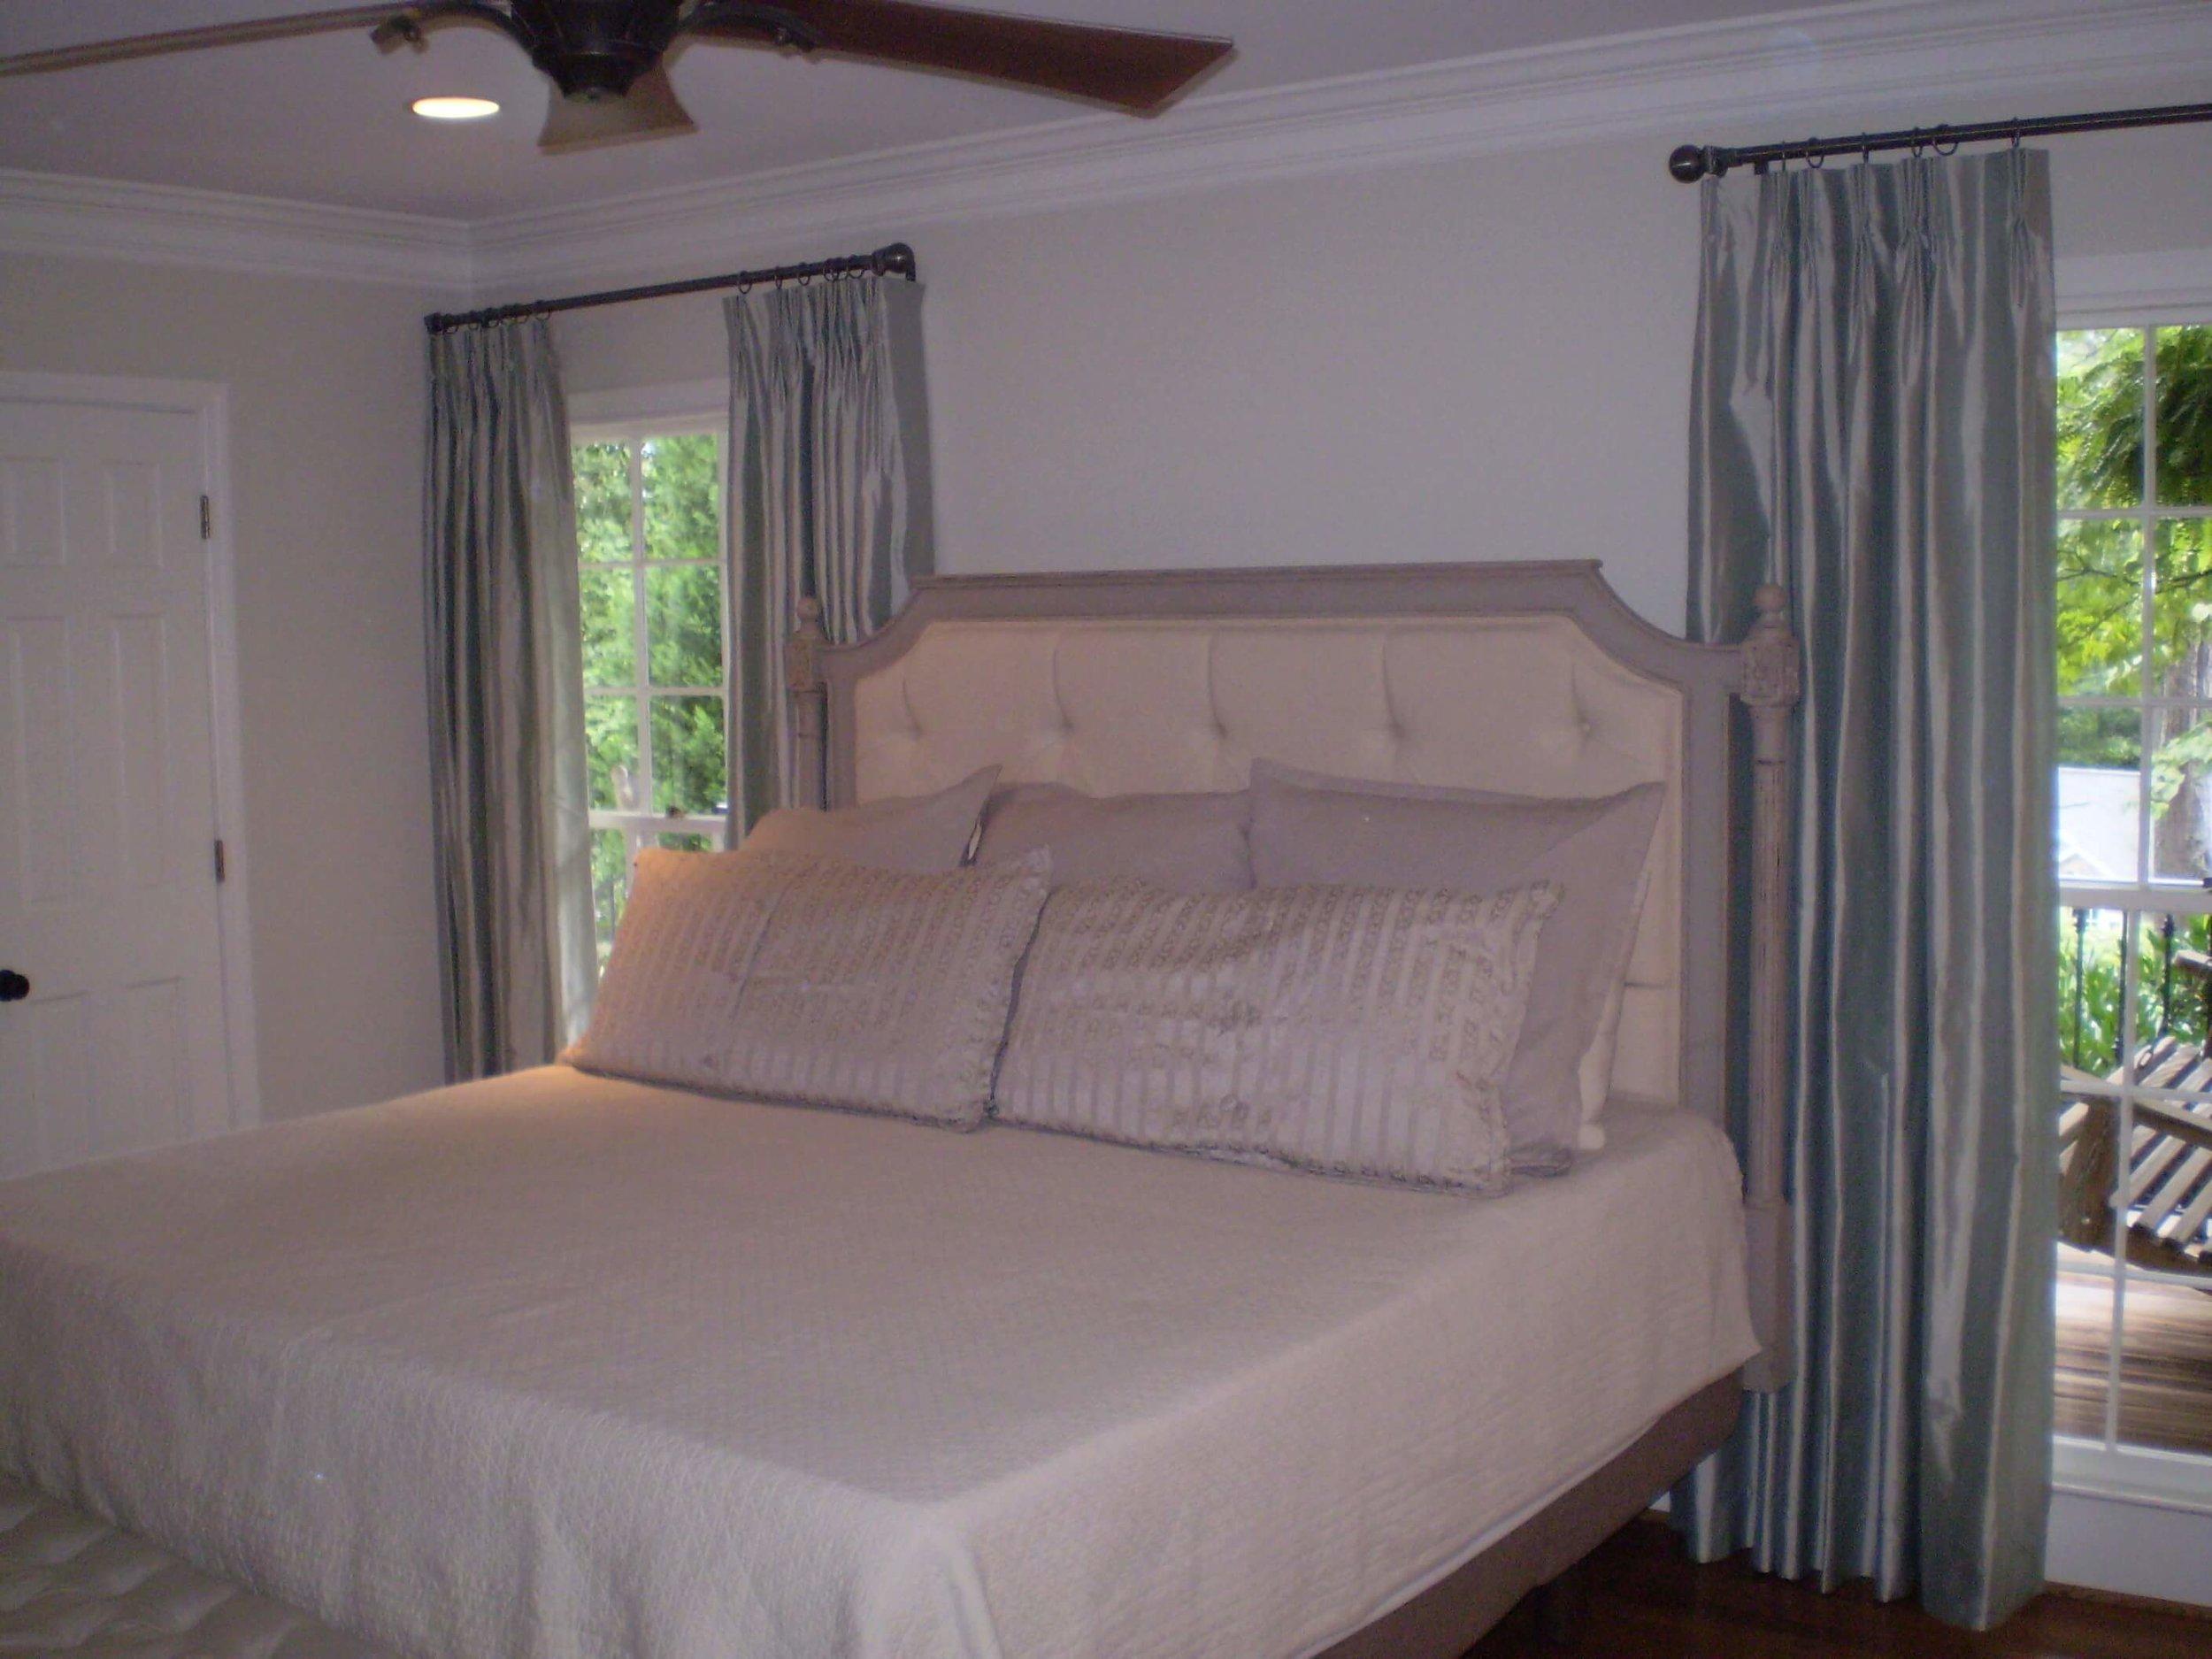 custom-bedding-linens-fabric-atlanta-georgia-7.JPG